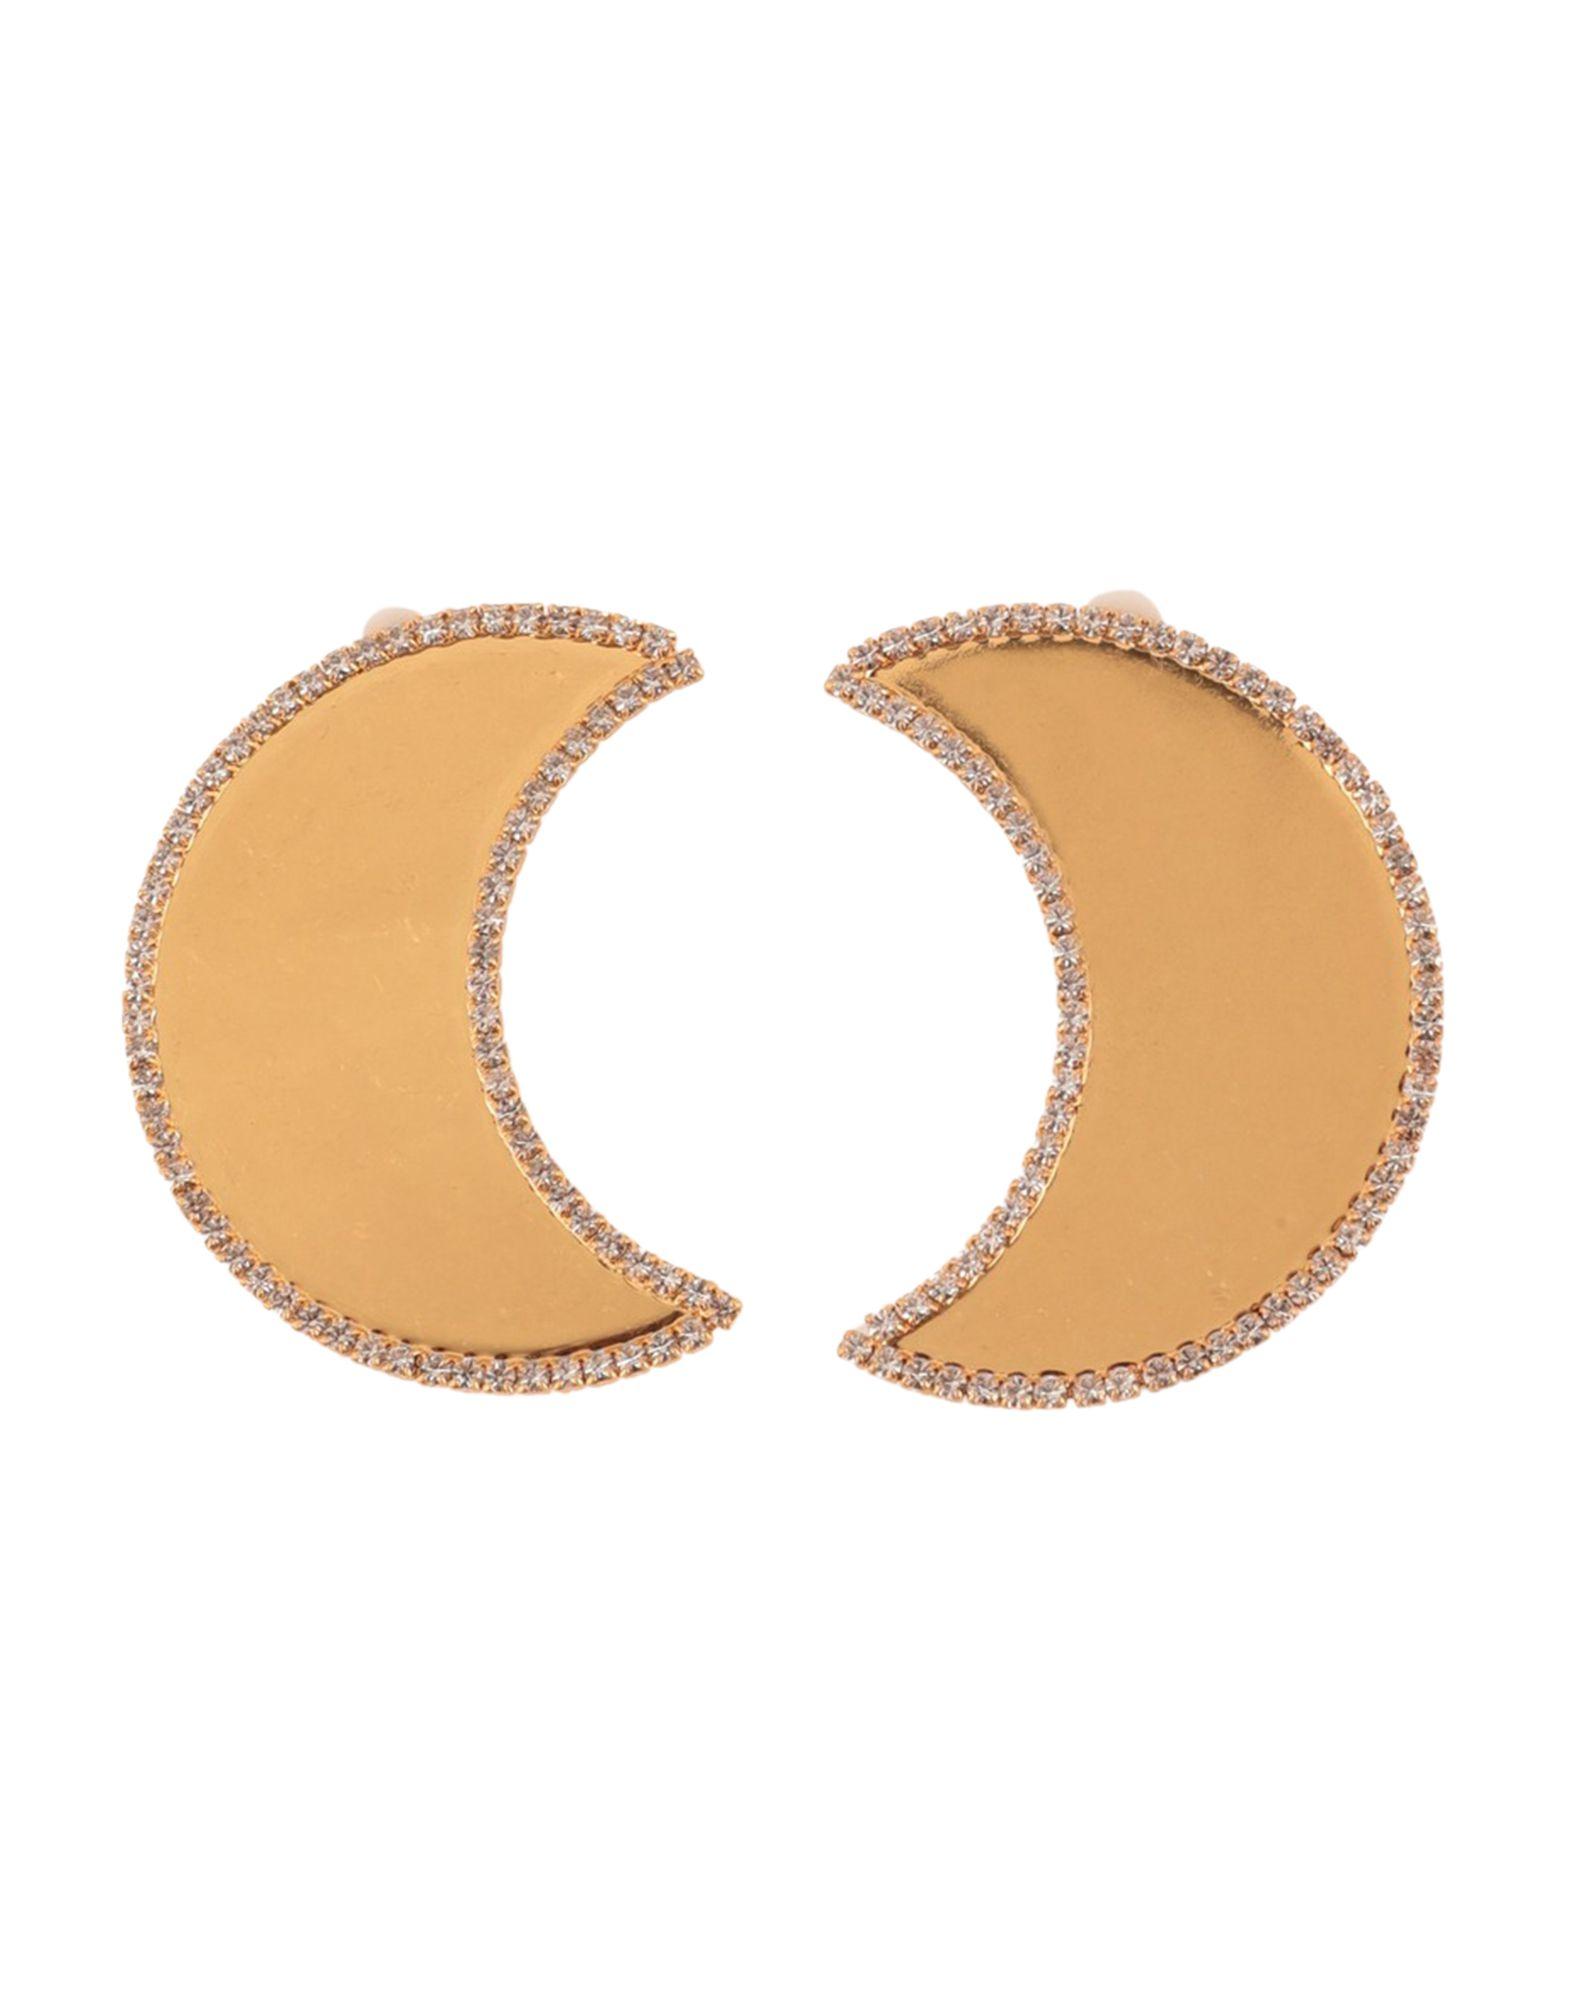 TORY BURCH Earrings - Item 50242334